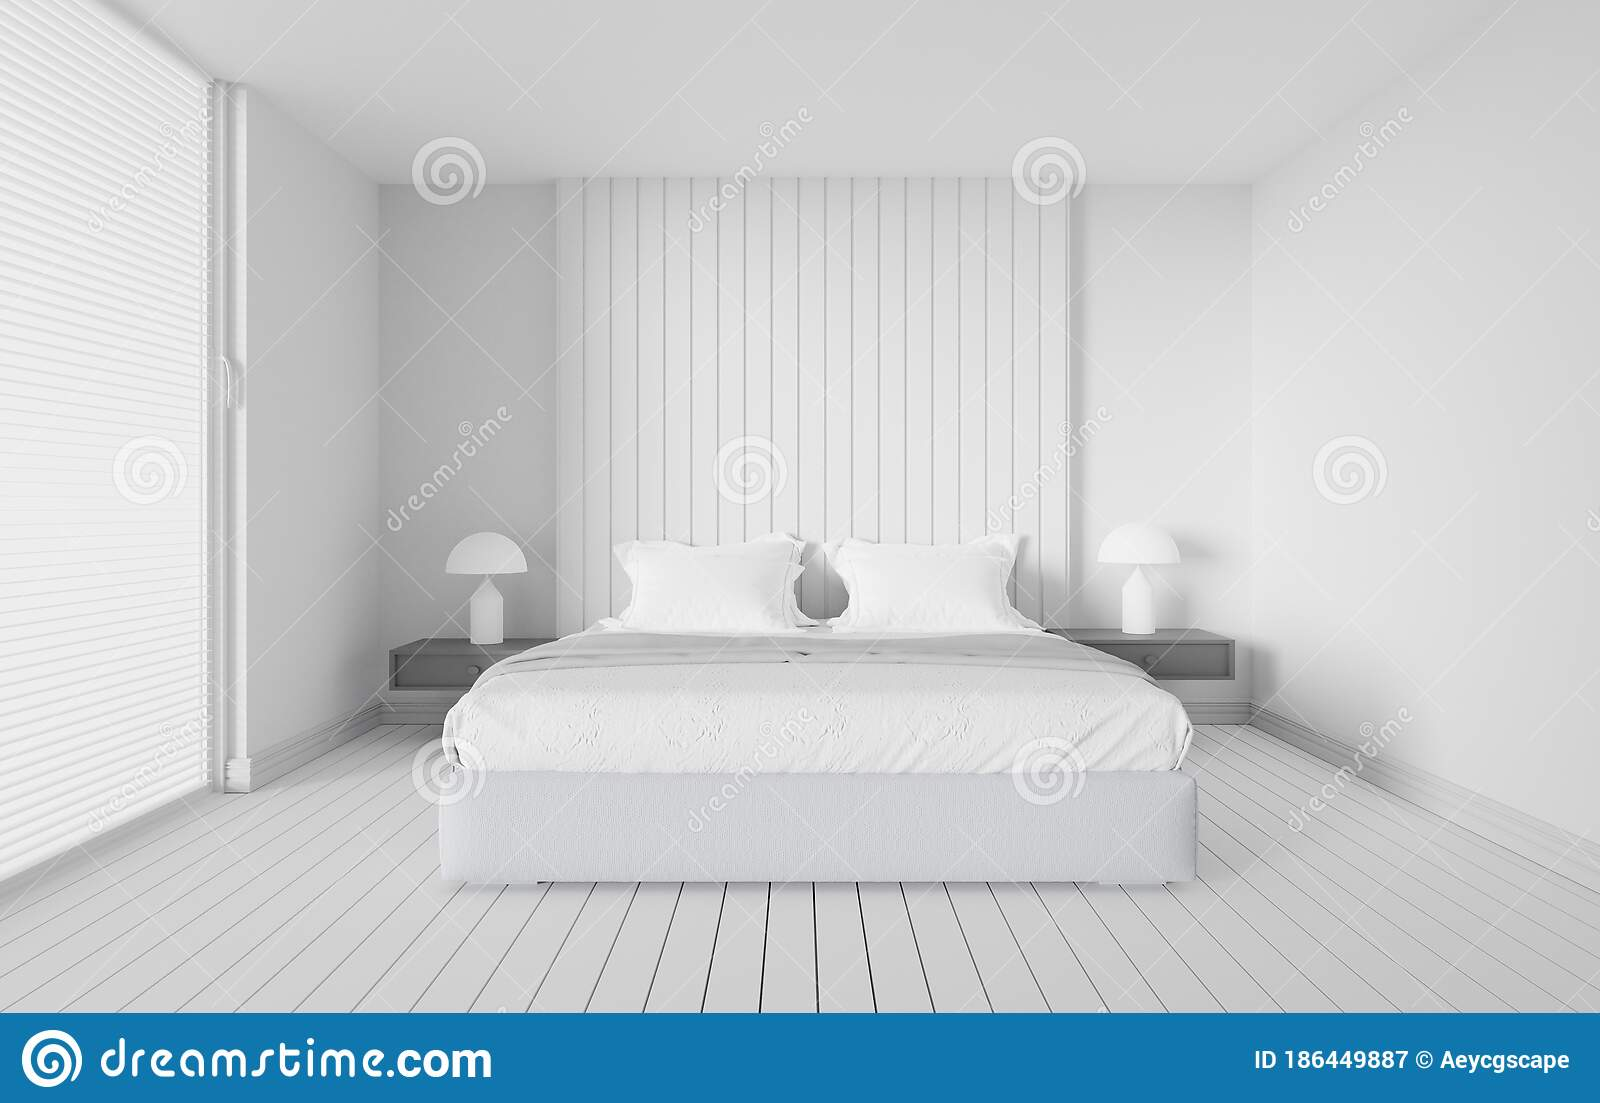 White Bedroom Interior Design 3d Render Scandinavian Modern Style Stock Illustration Illustration Of Comfortable Hotel 186449887